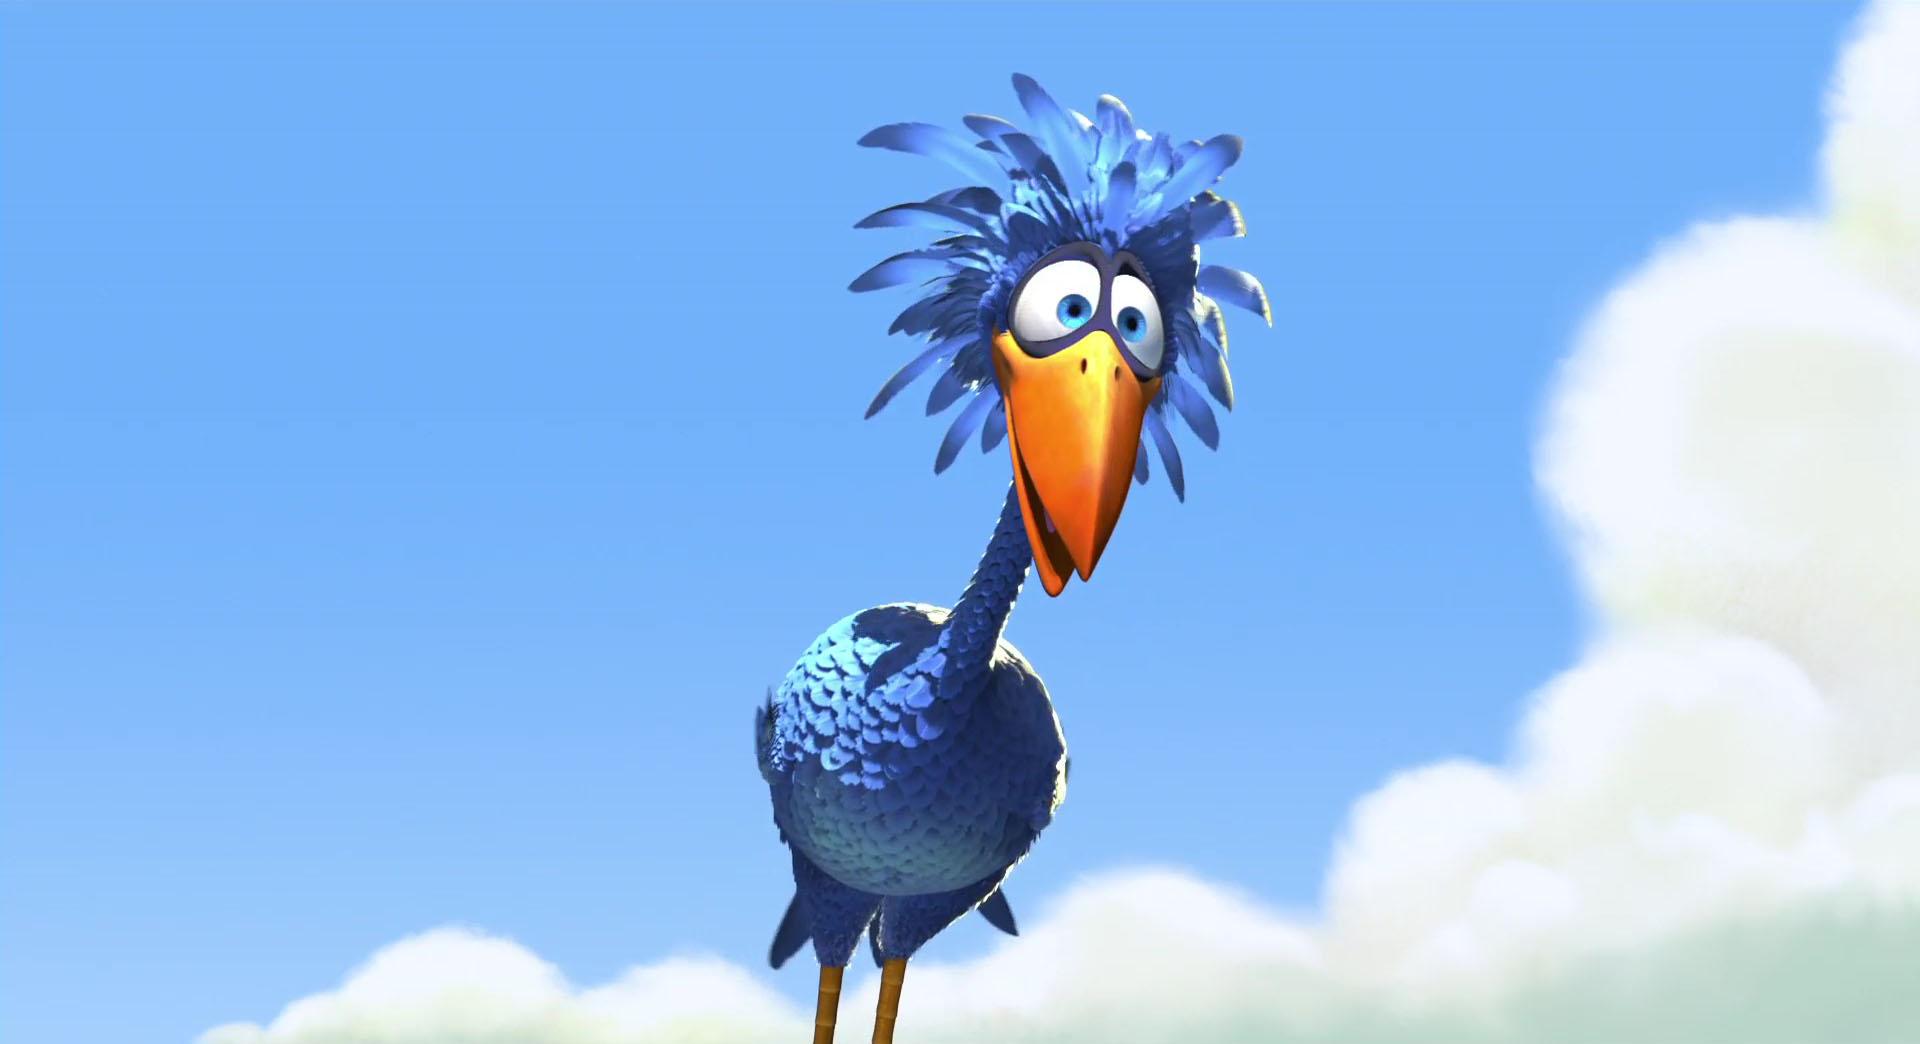 grand-oiseau-personnage-drole-oiseau-ligne-haute-tension-02